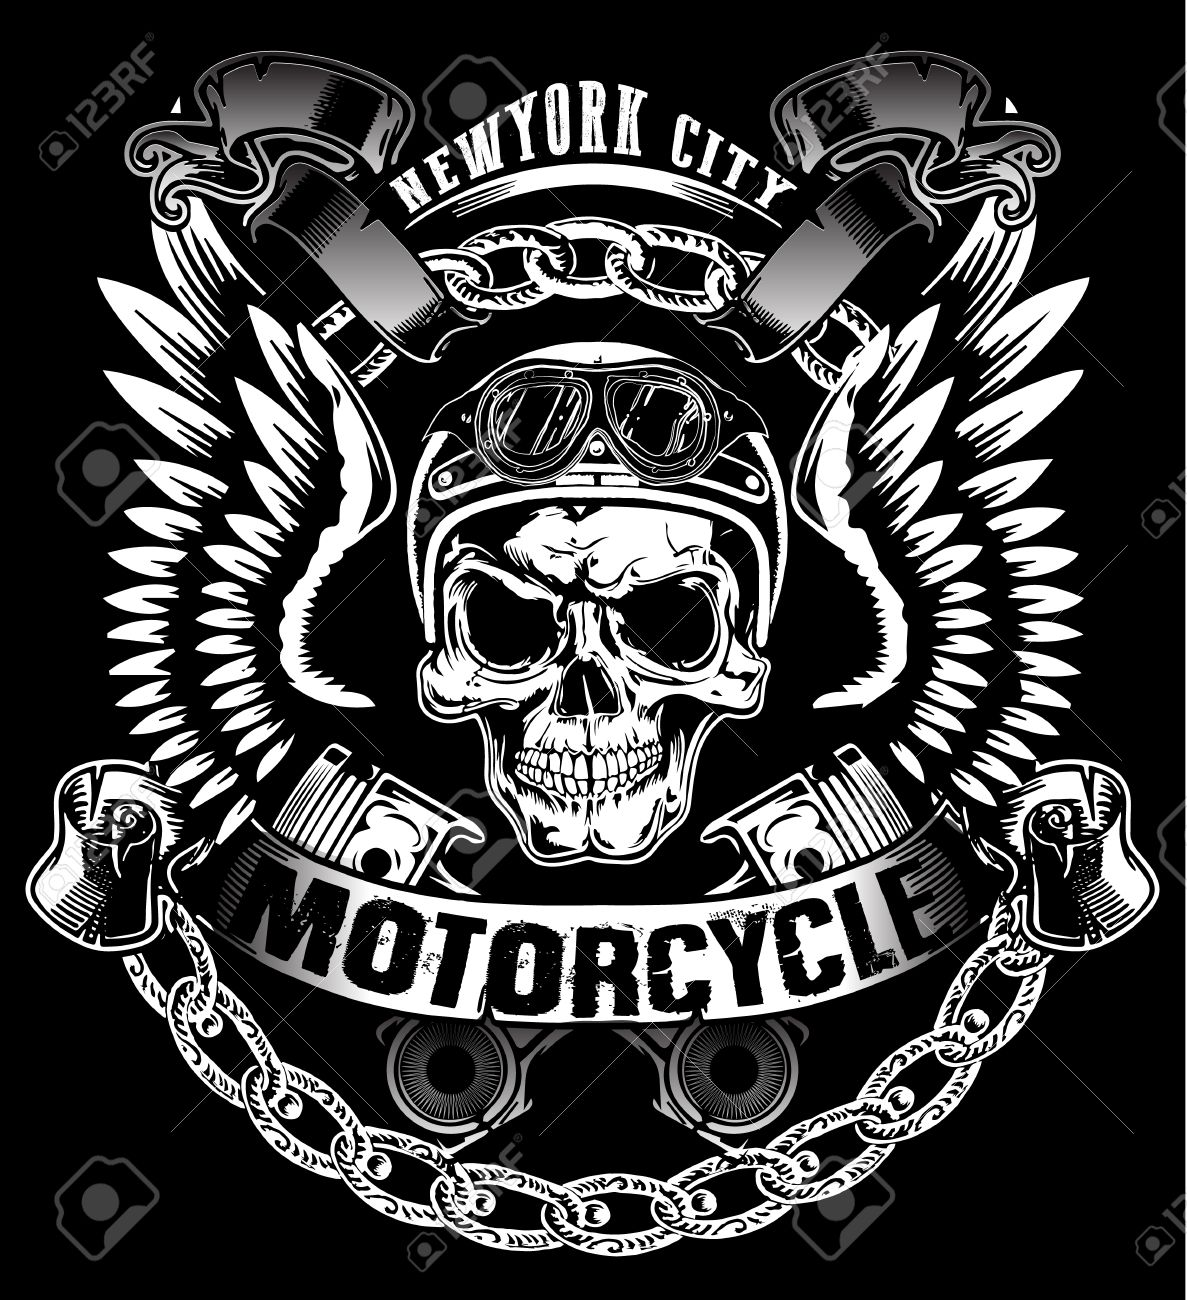 Design t shirts graphic - Skull T Shirt Graphic Design Stock Vector 55095906